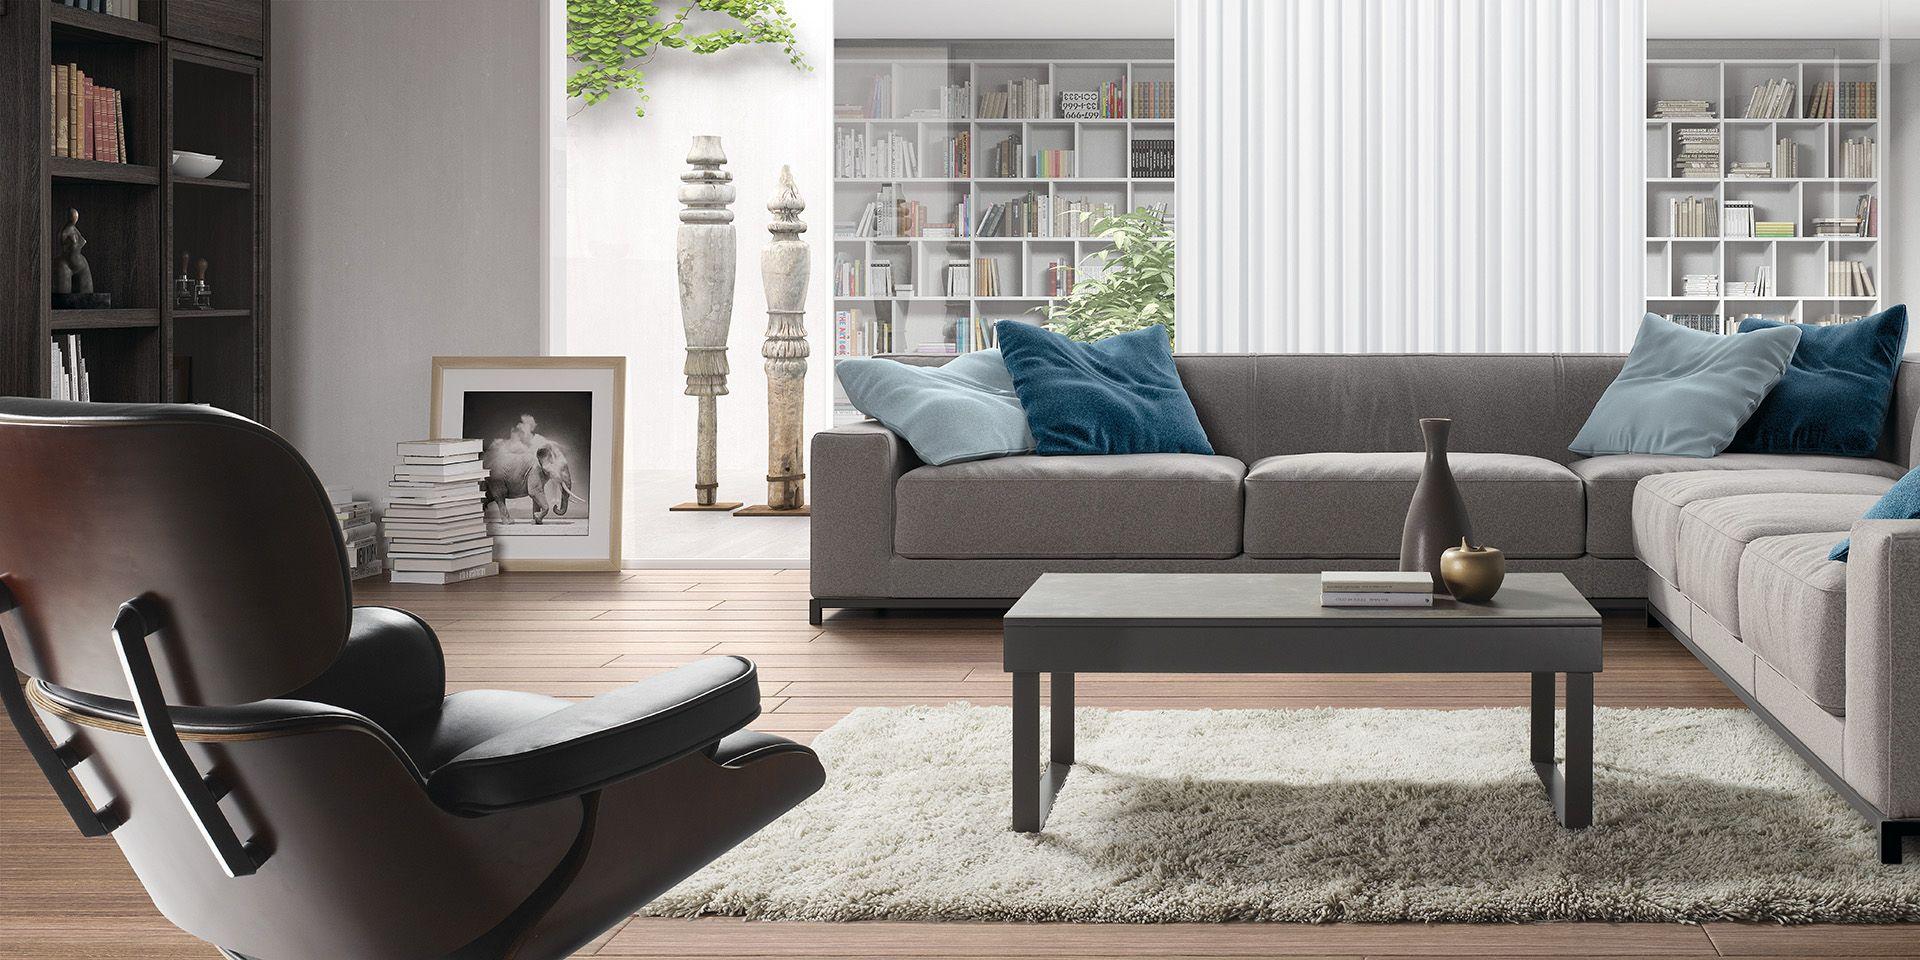 Interior de estilo moderno. Sillon y reposapiés junto a sofá ...